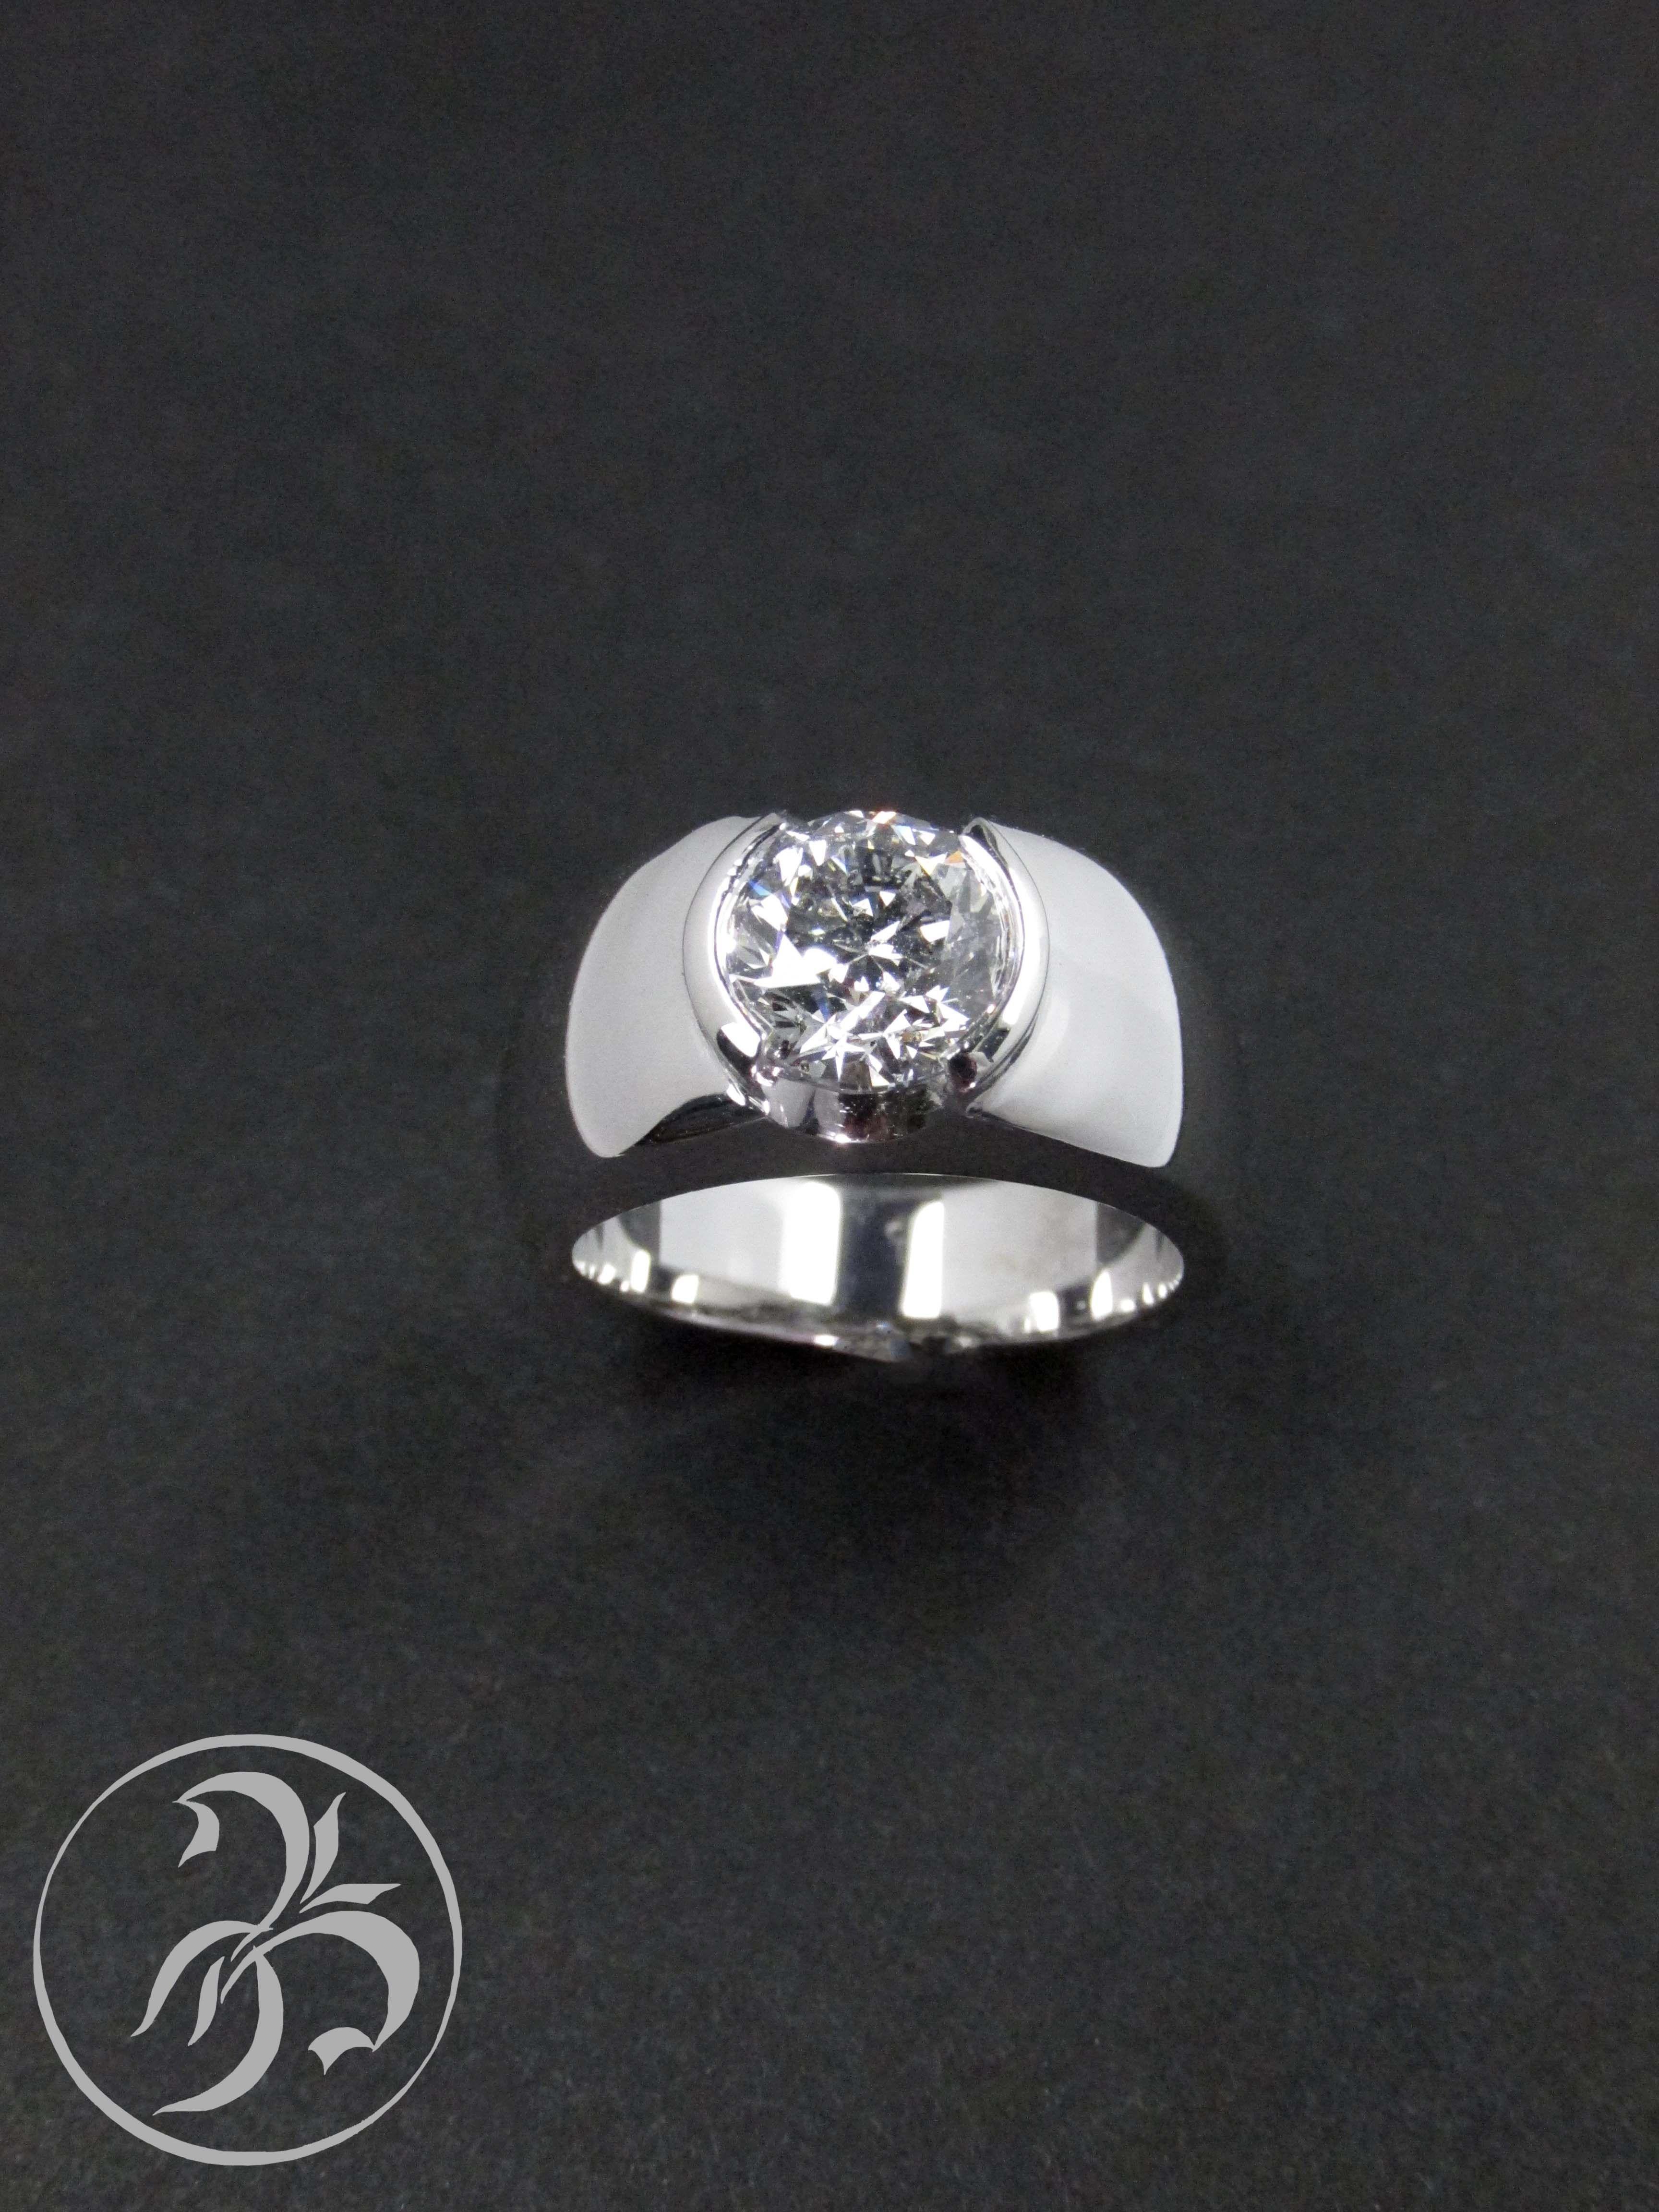 Wide band engagement ring with bezel set diamond 180 carat round